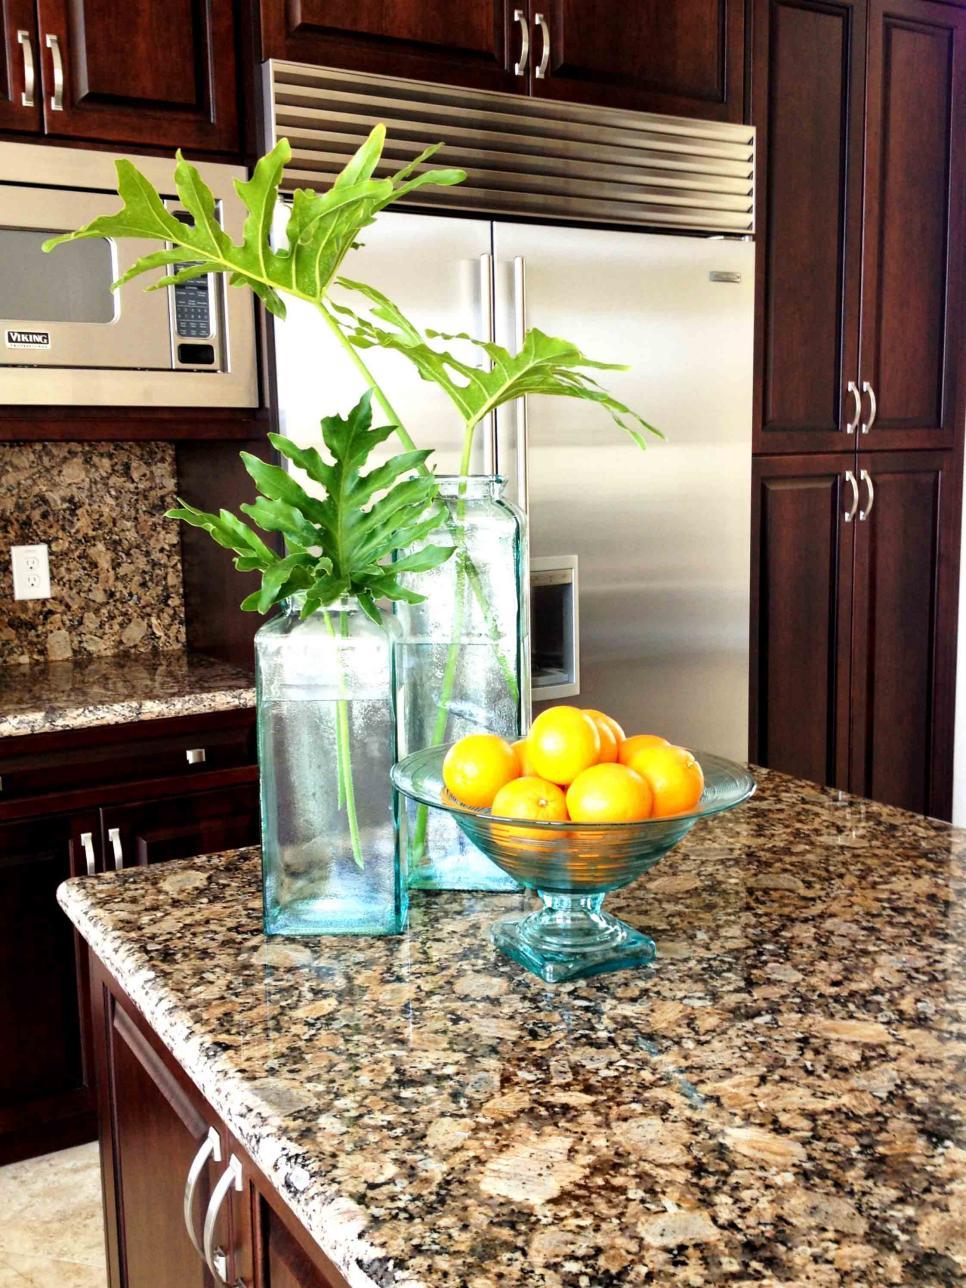 Uncategorized Best Kitchen Countertops our 13 favorite kitchen countertop materials hgtv